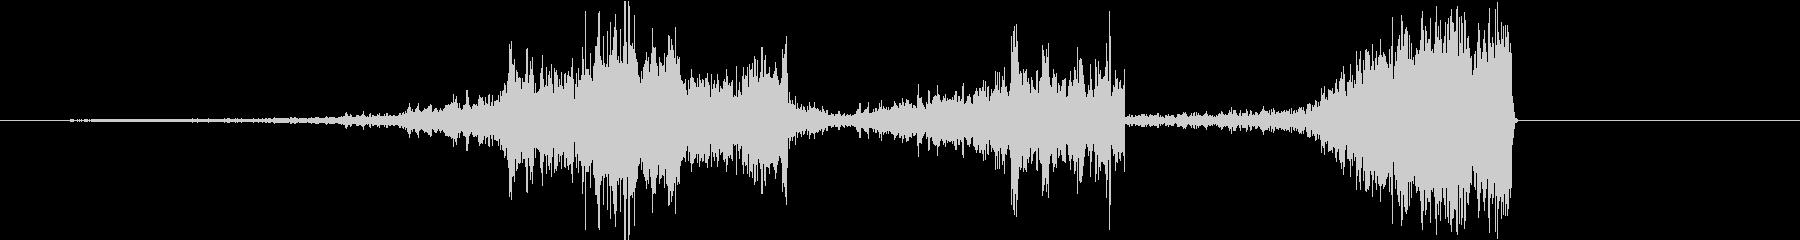 Video 巻戻し タイムリープ 効果音の未再生の波形